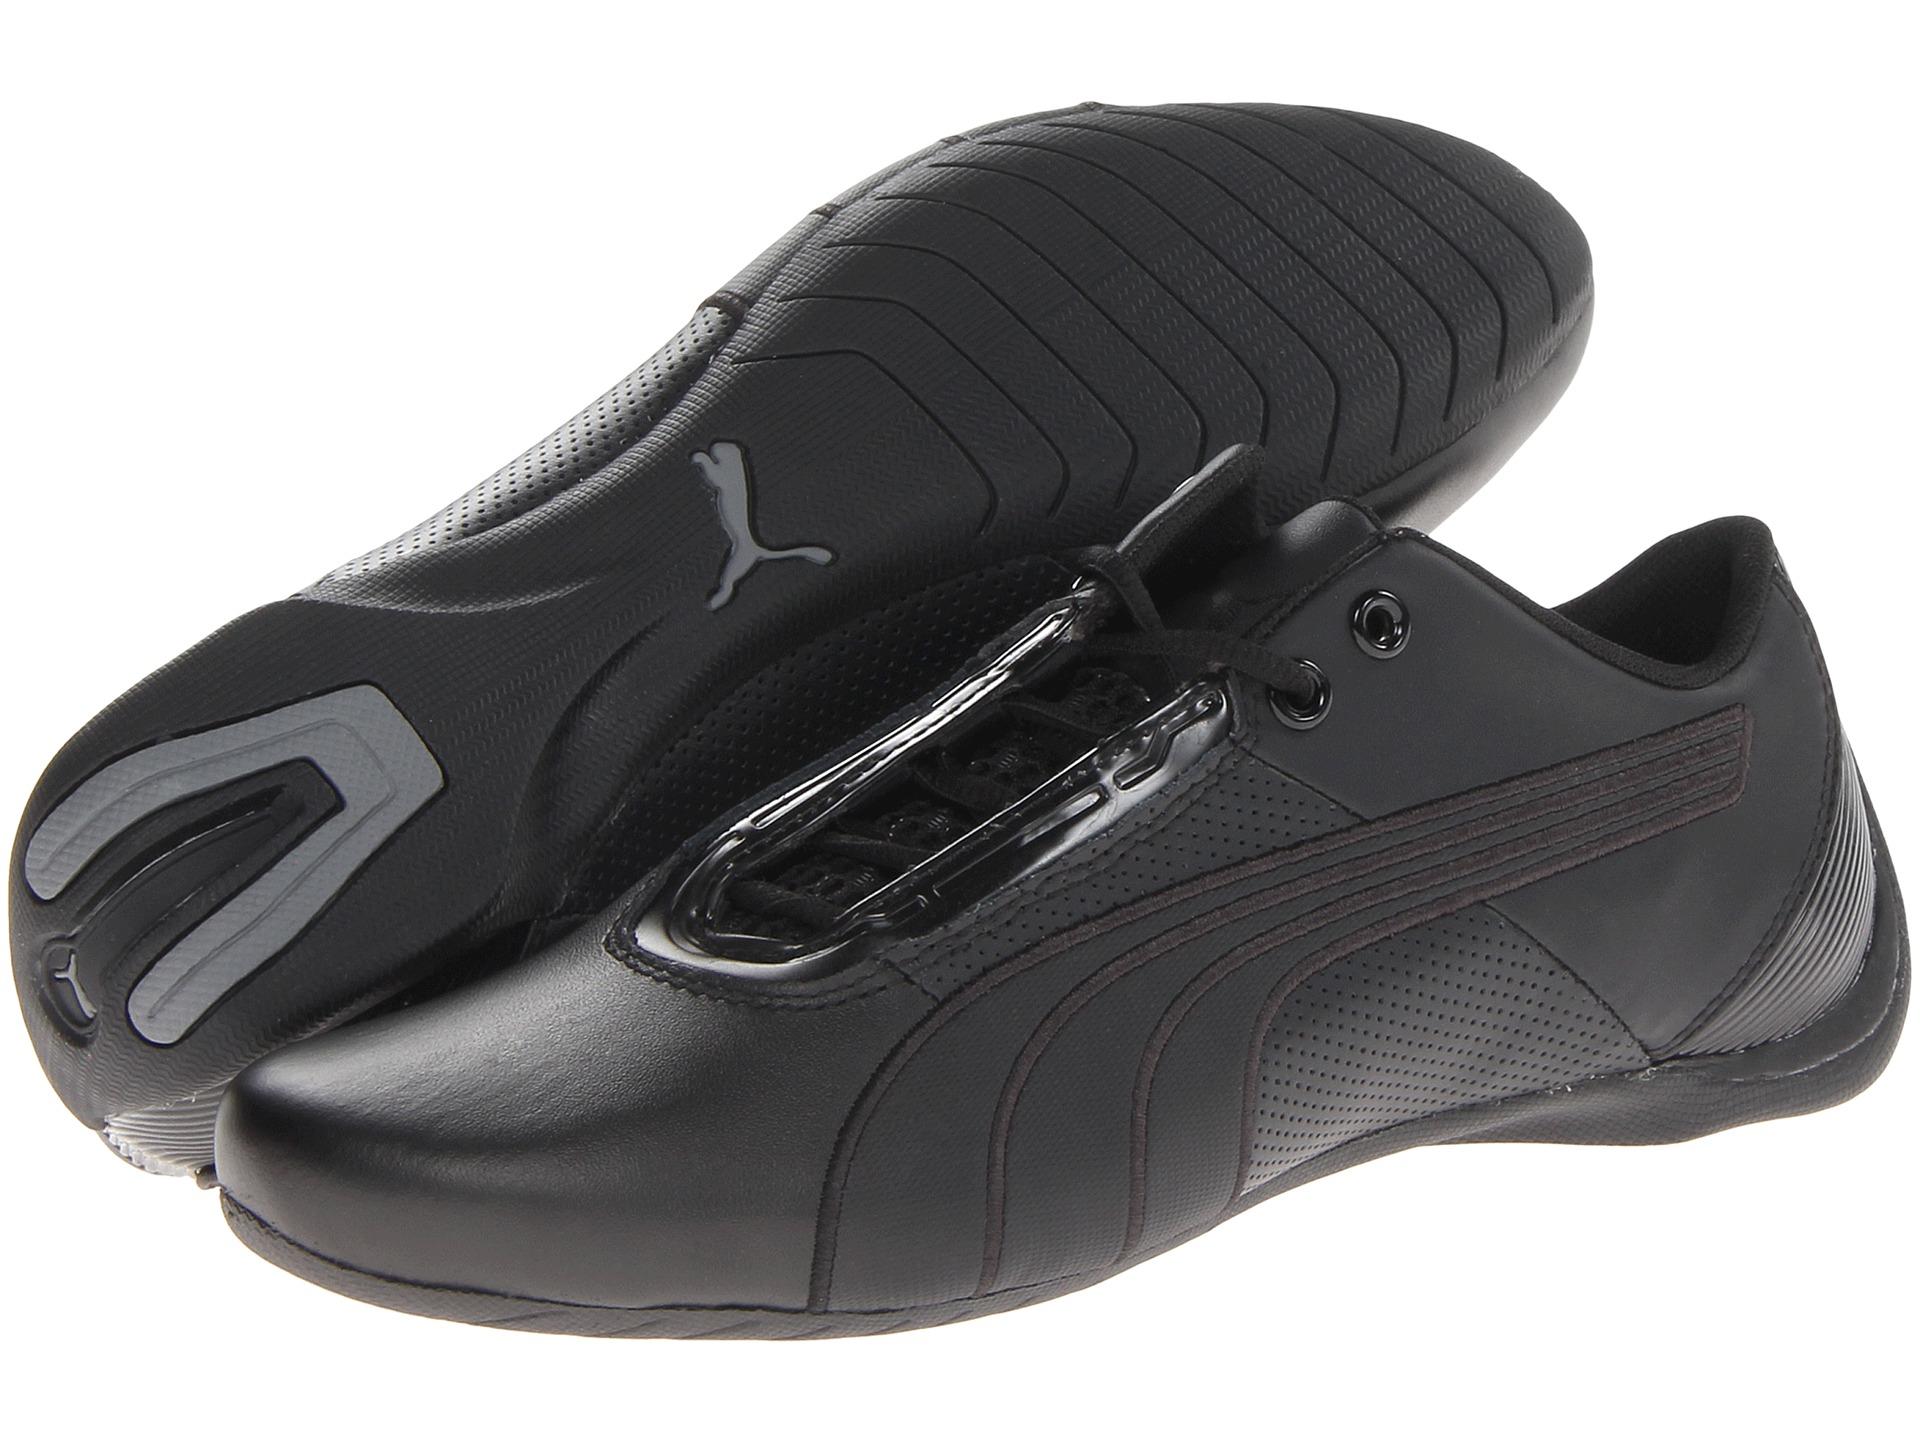 Puma Future Cat S1 Shoes Men Shipped Free At Zappos